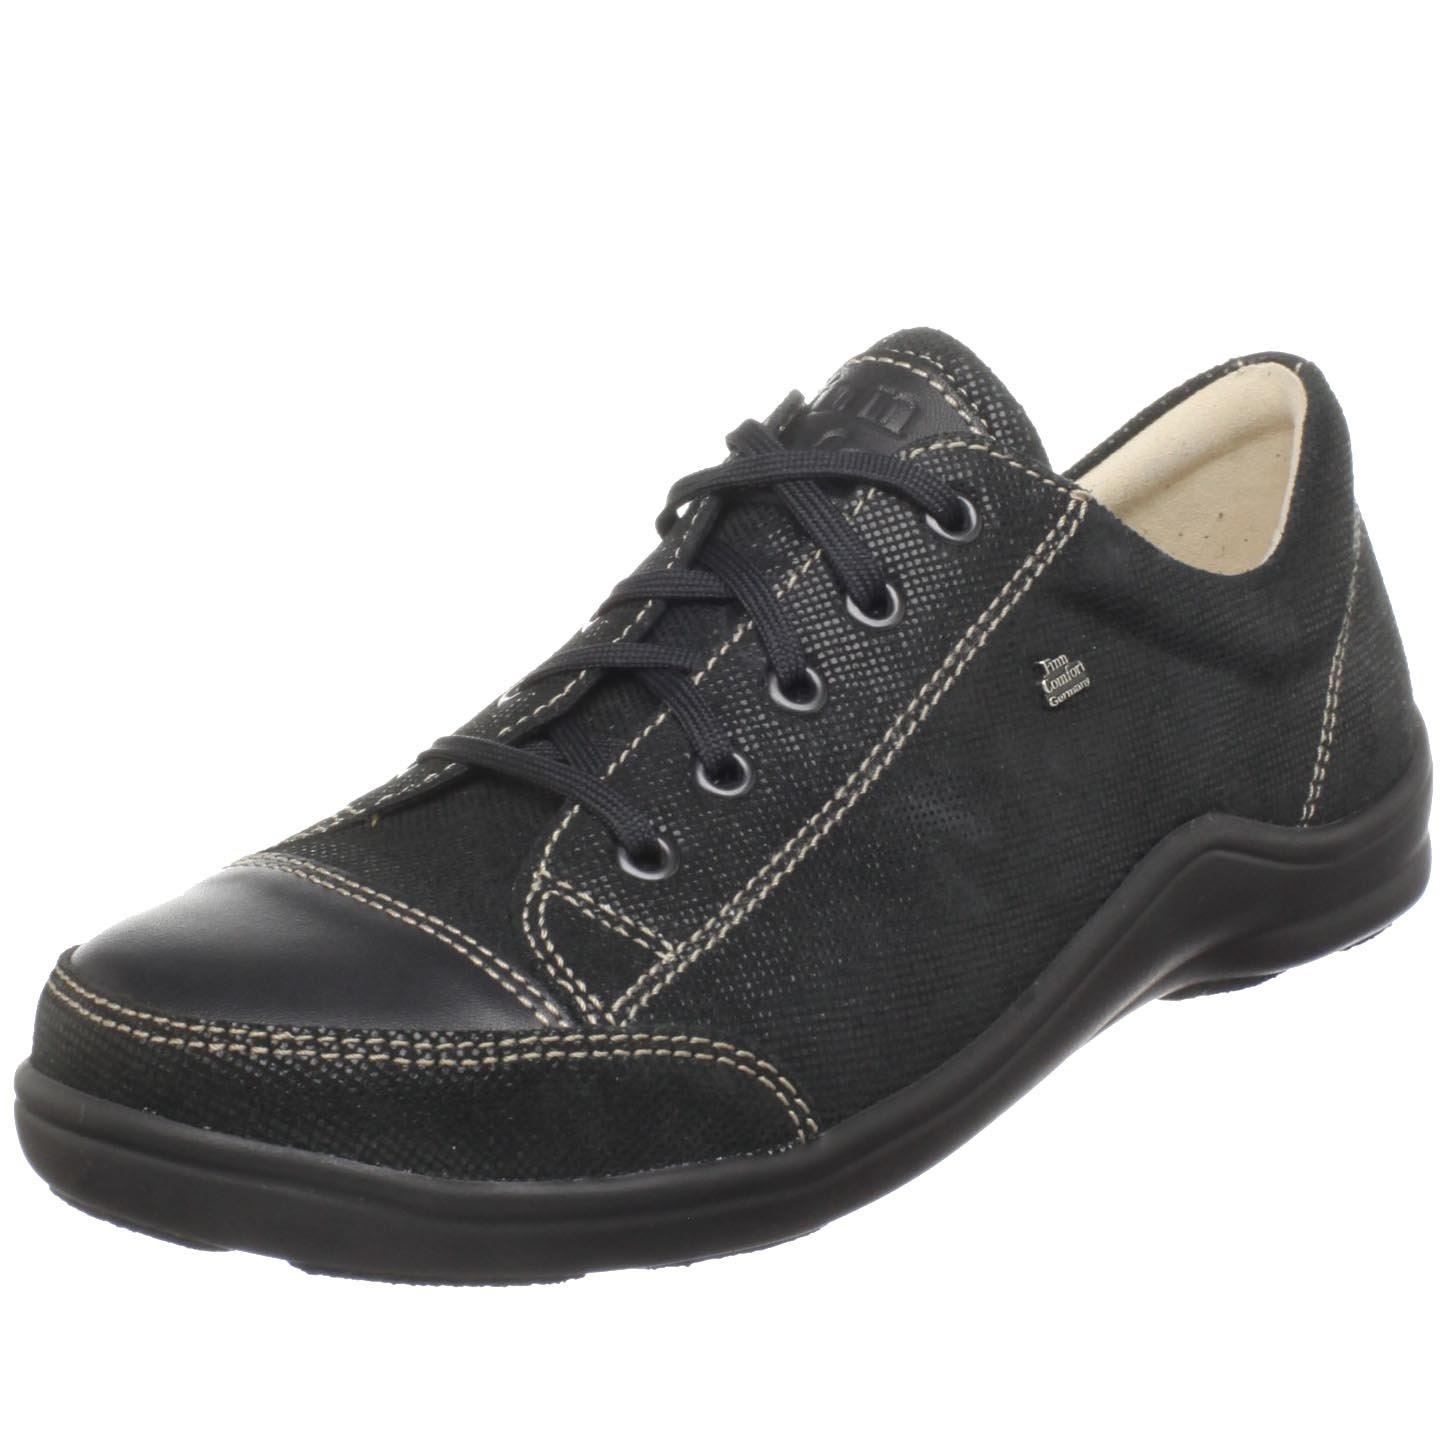 Finn Comfort Women's Soft Soho Fashion Sneaker B003GXFWQU 39 M EU / 8 B(M)|Black Minipoints/Nappa